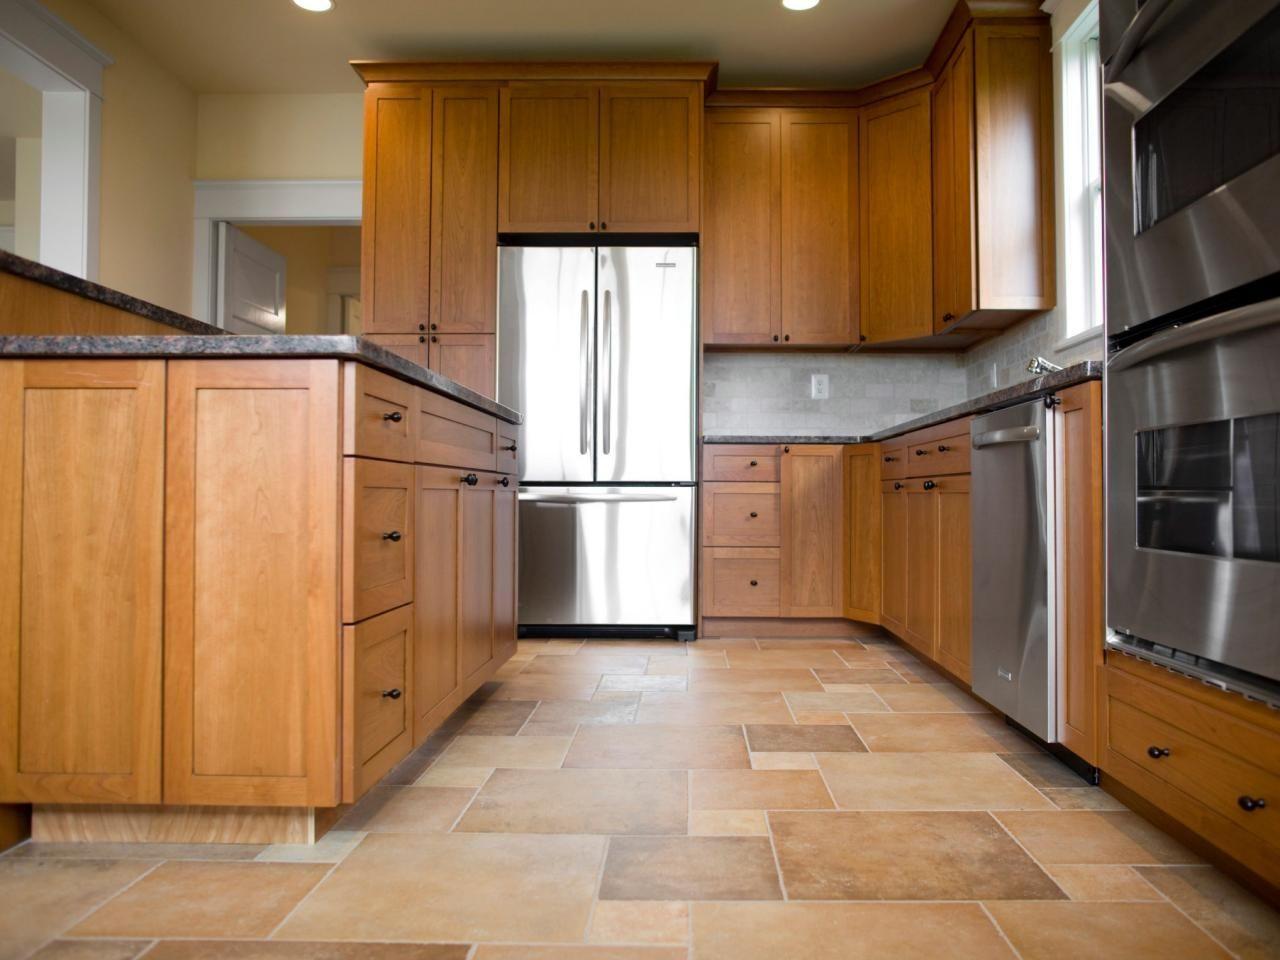 Best Types Of Tile For Kitchen Floor Httpweb4top